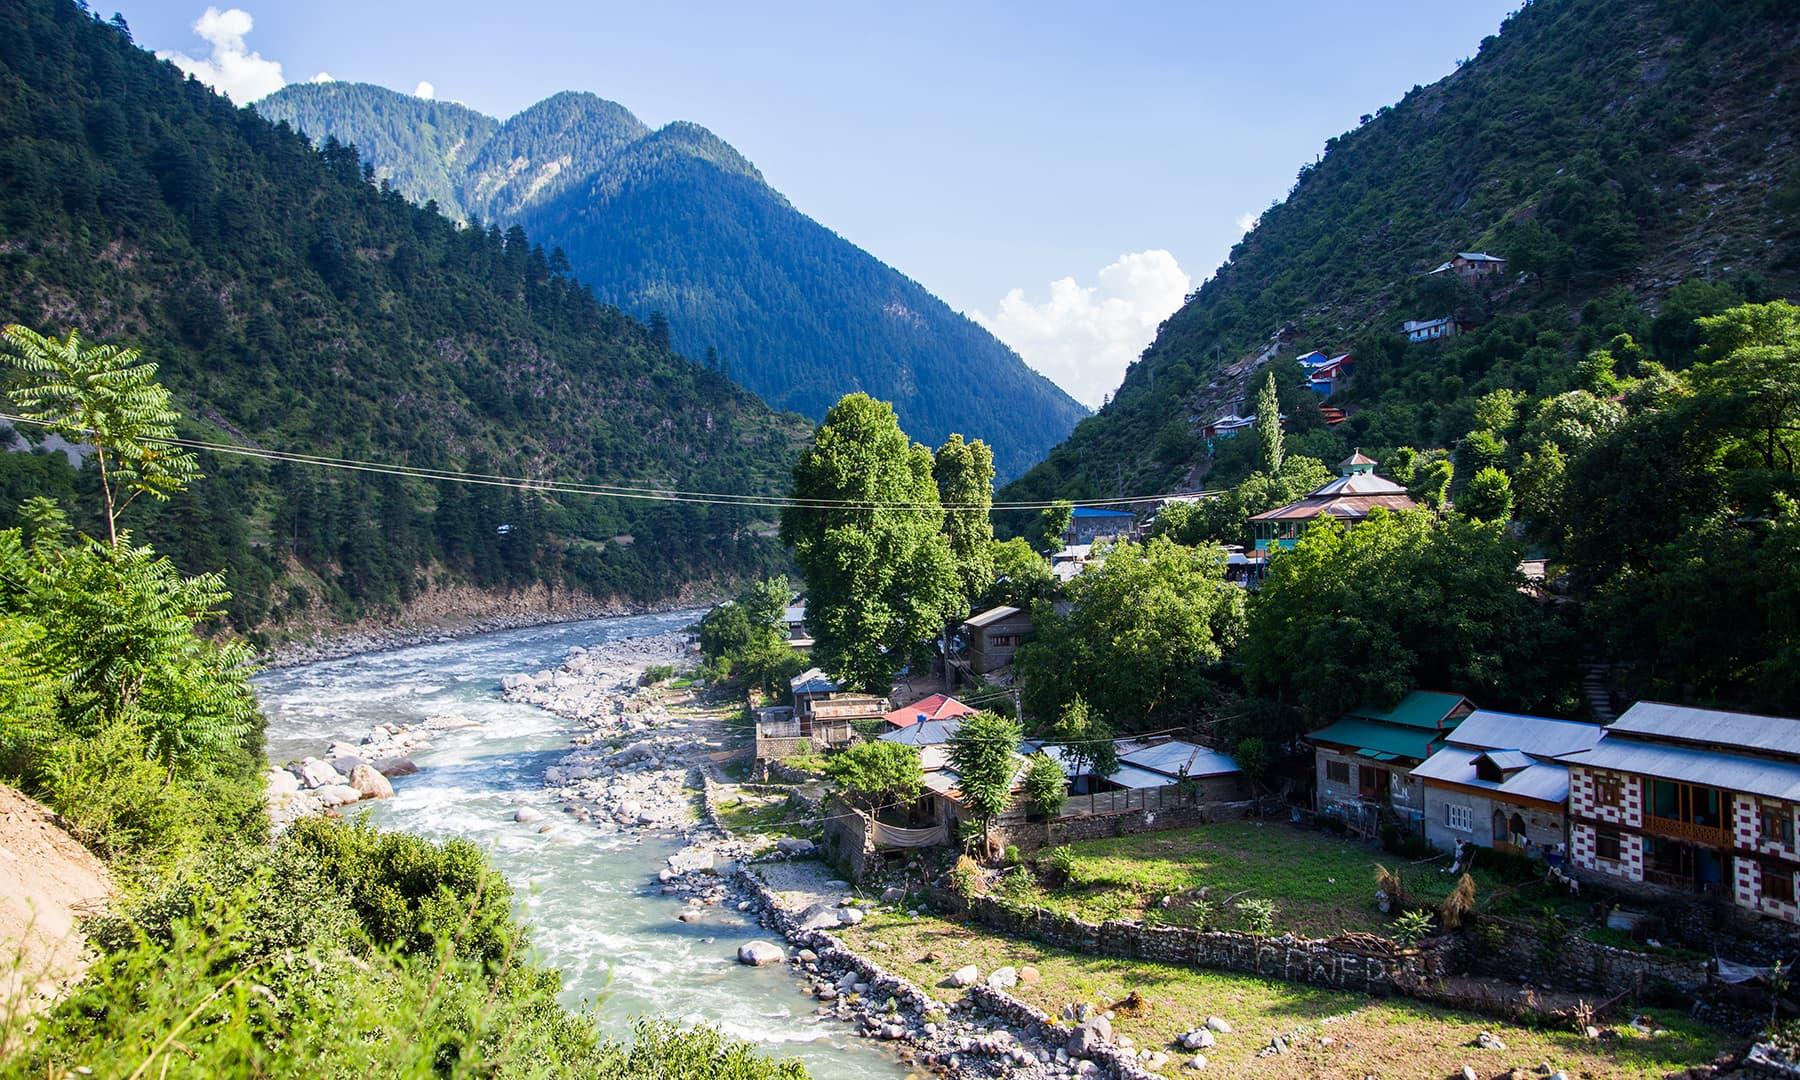 Kundal Shahi en route Keran. —Marvi Soomro